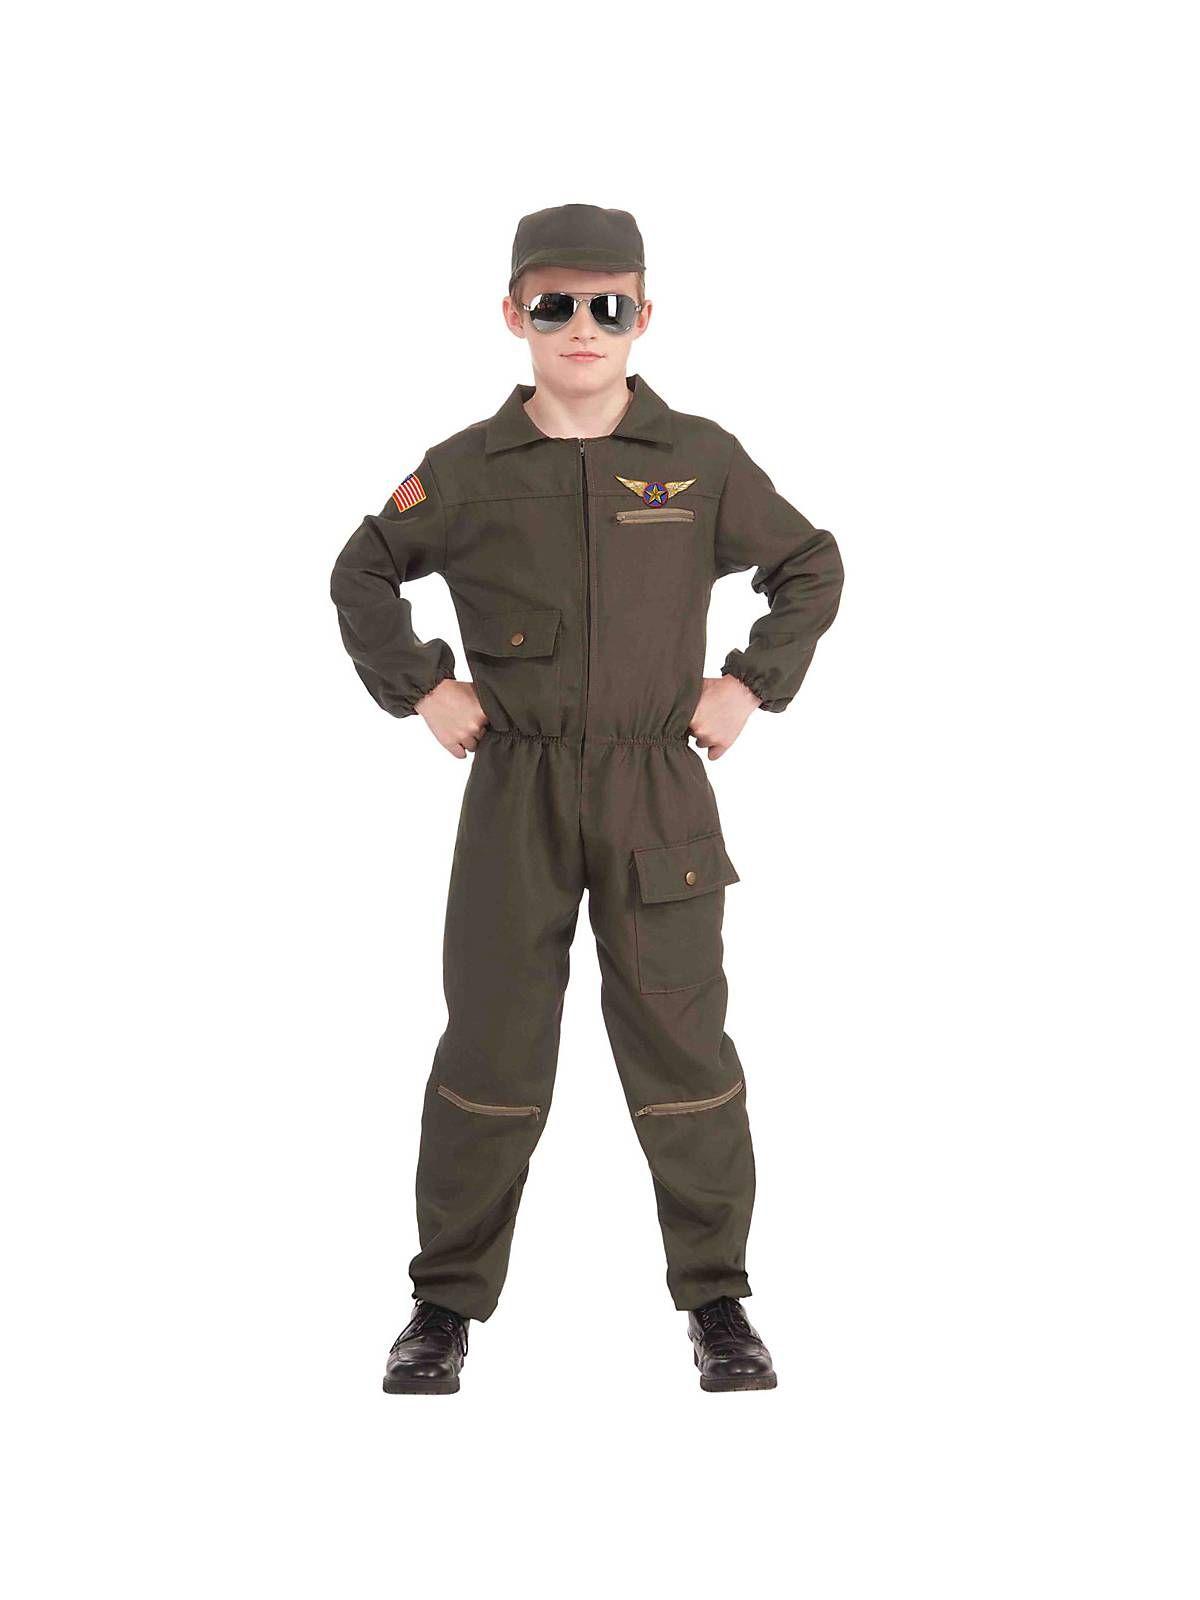 Popular Kids Halloween Costumes 2019.Child Fighter Jet Pilot Costume Costumes In 2019 Boy